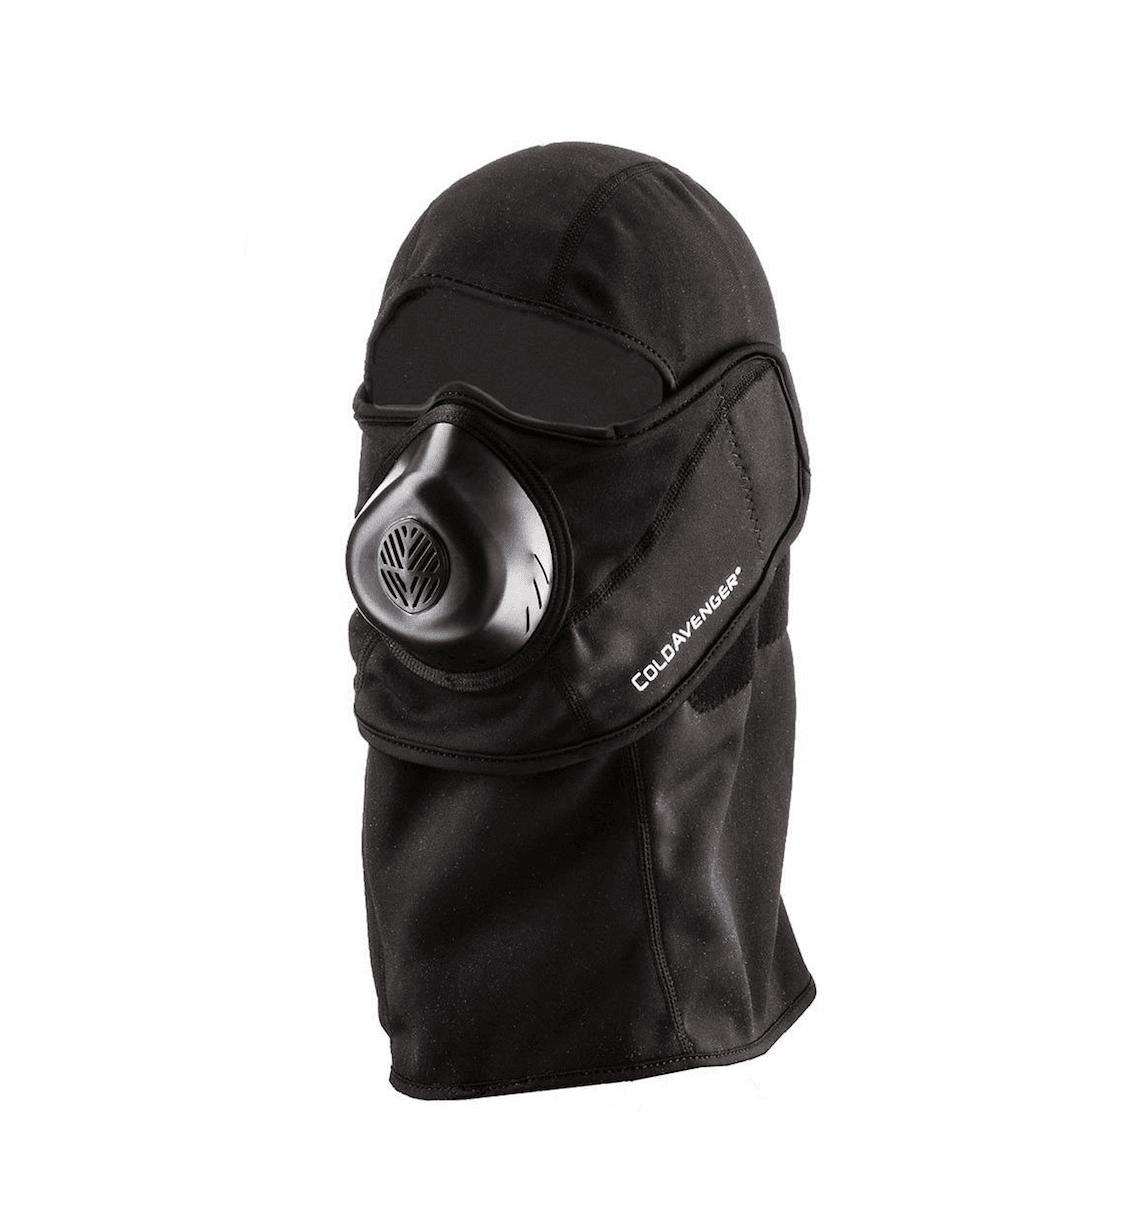 SQOOP-outdoor-ColdAvenger Expedition balaklava Black